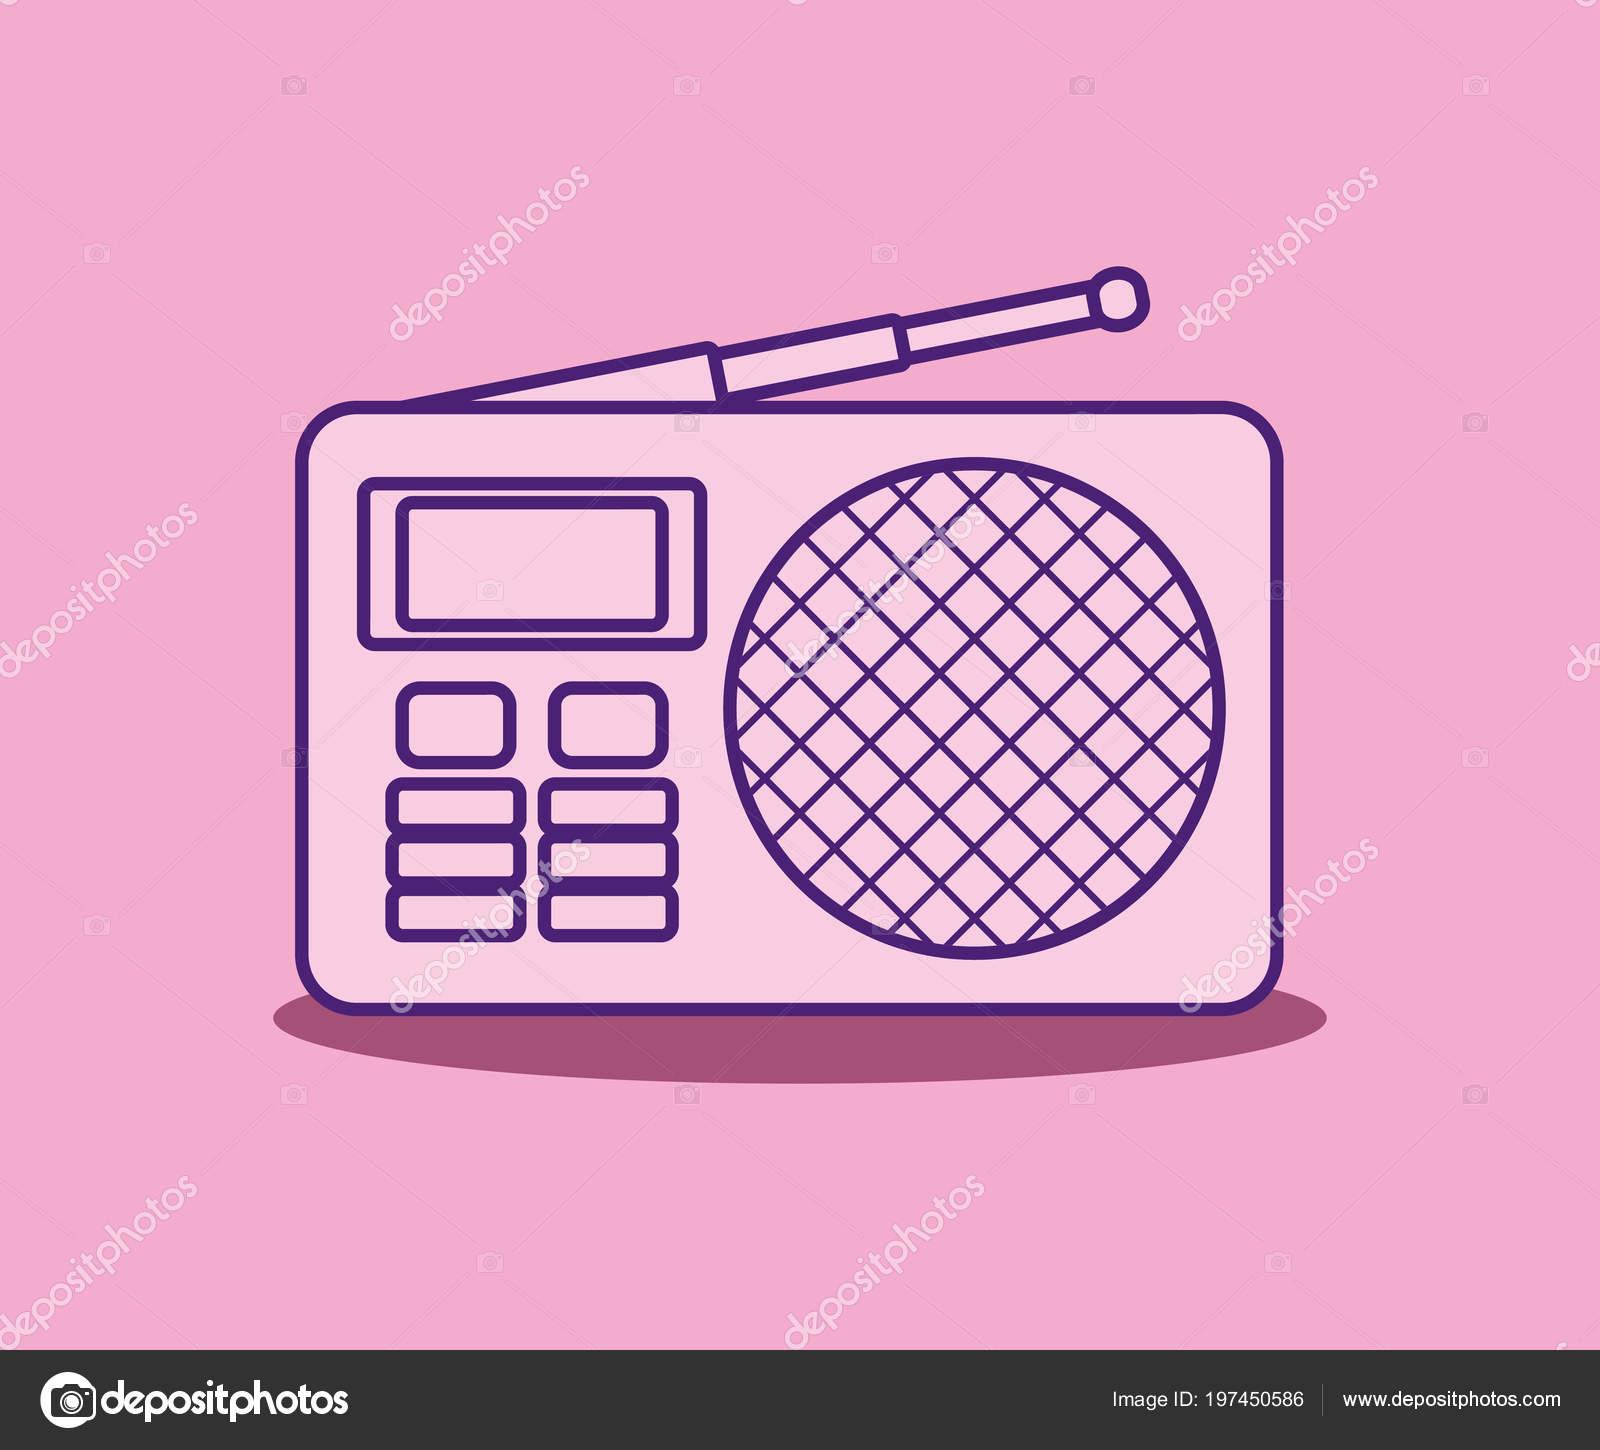 Retro radio design — Stock Vector © djv #197450586